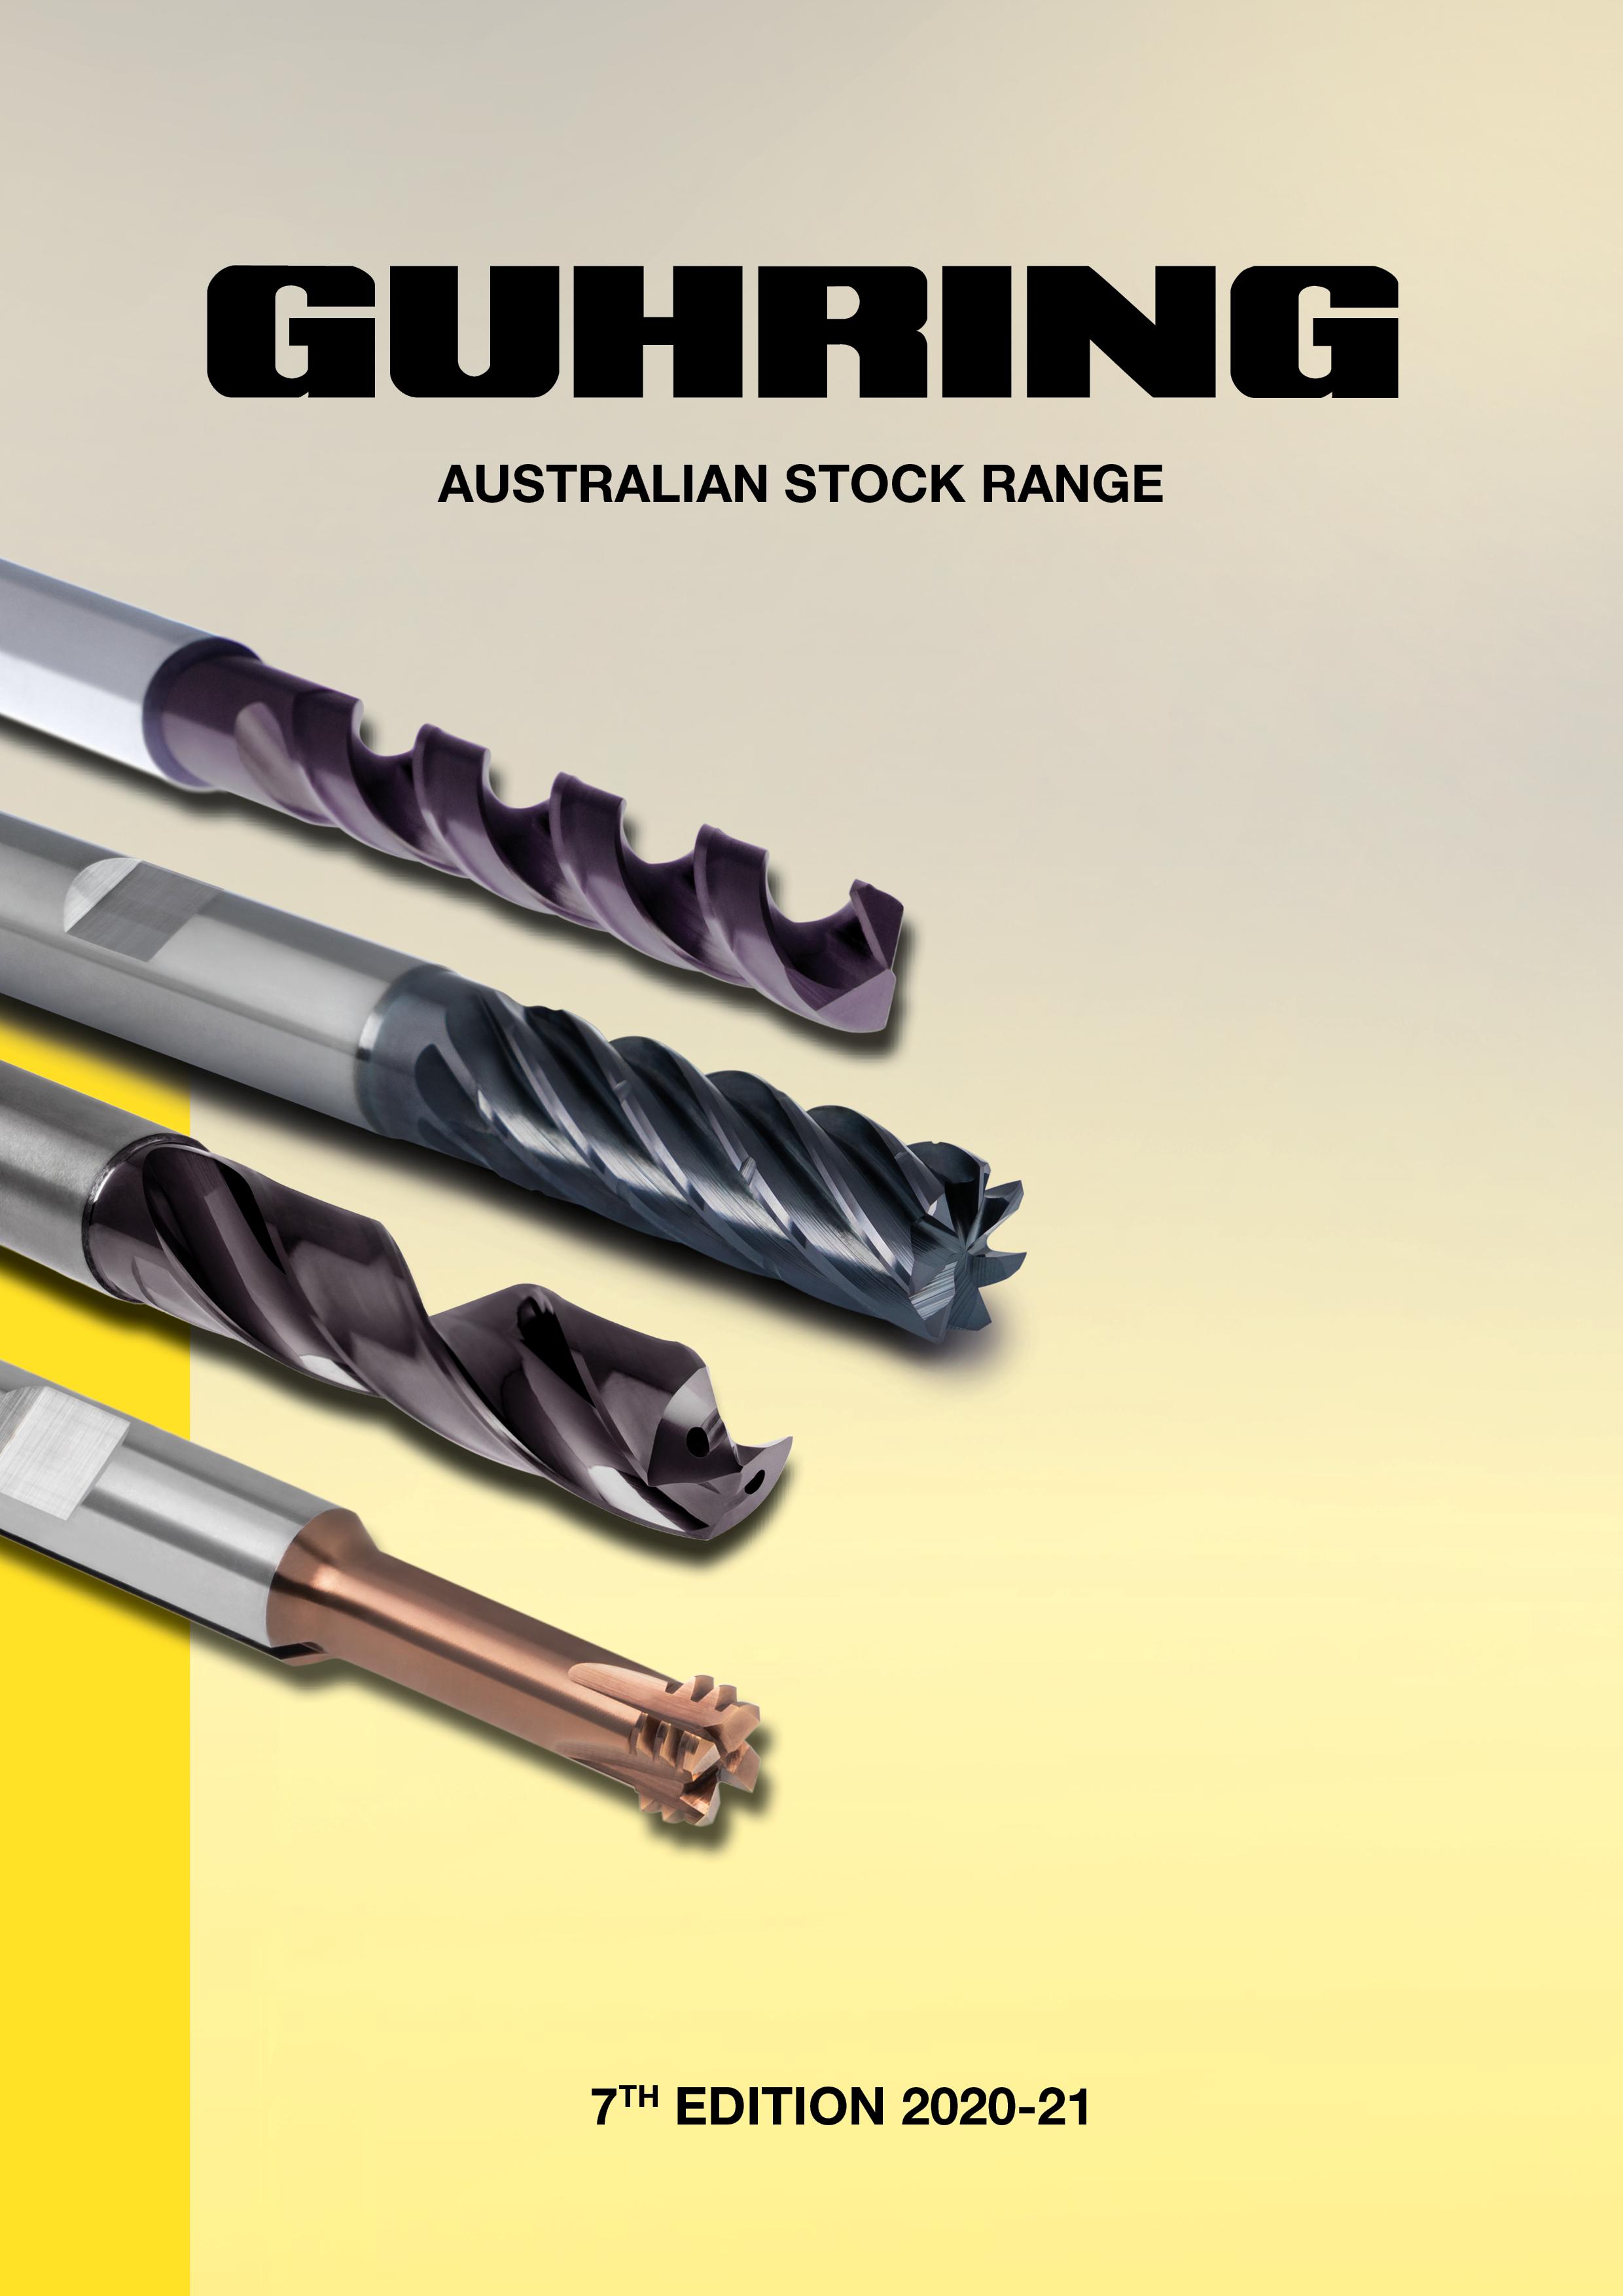 Guhring Australian Stock Range Catalogue 2020-2021